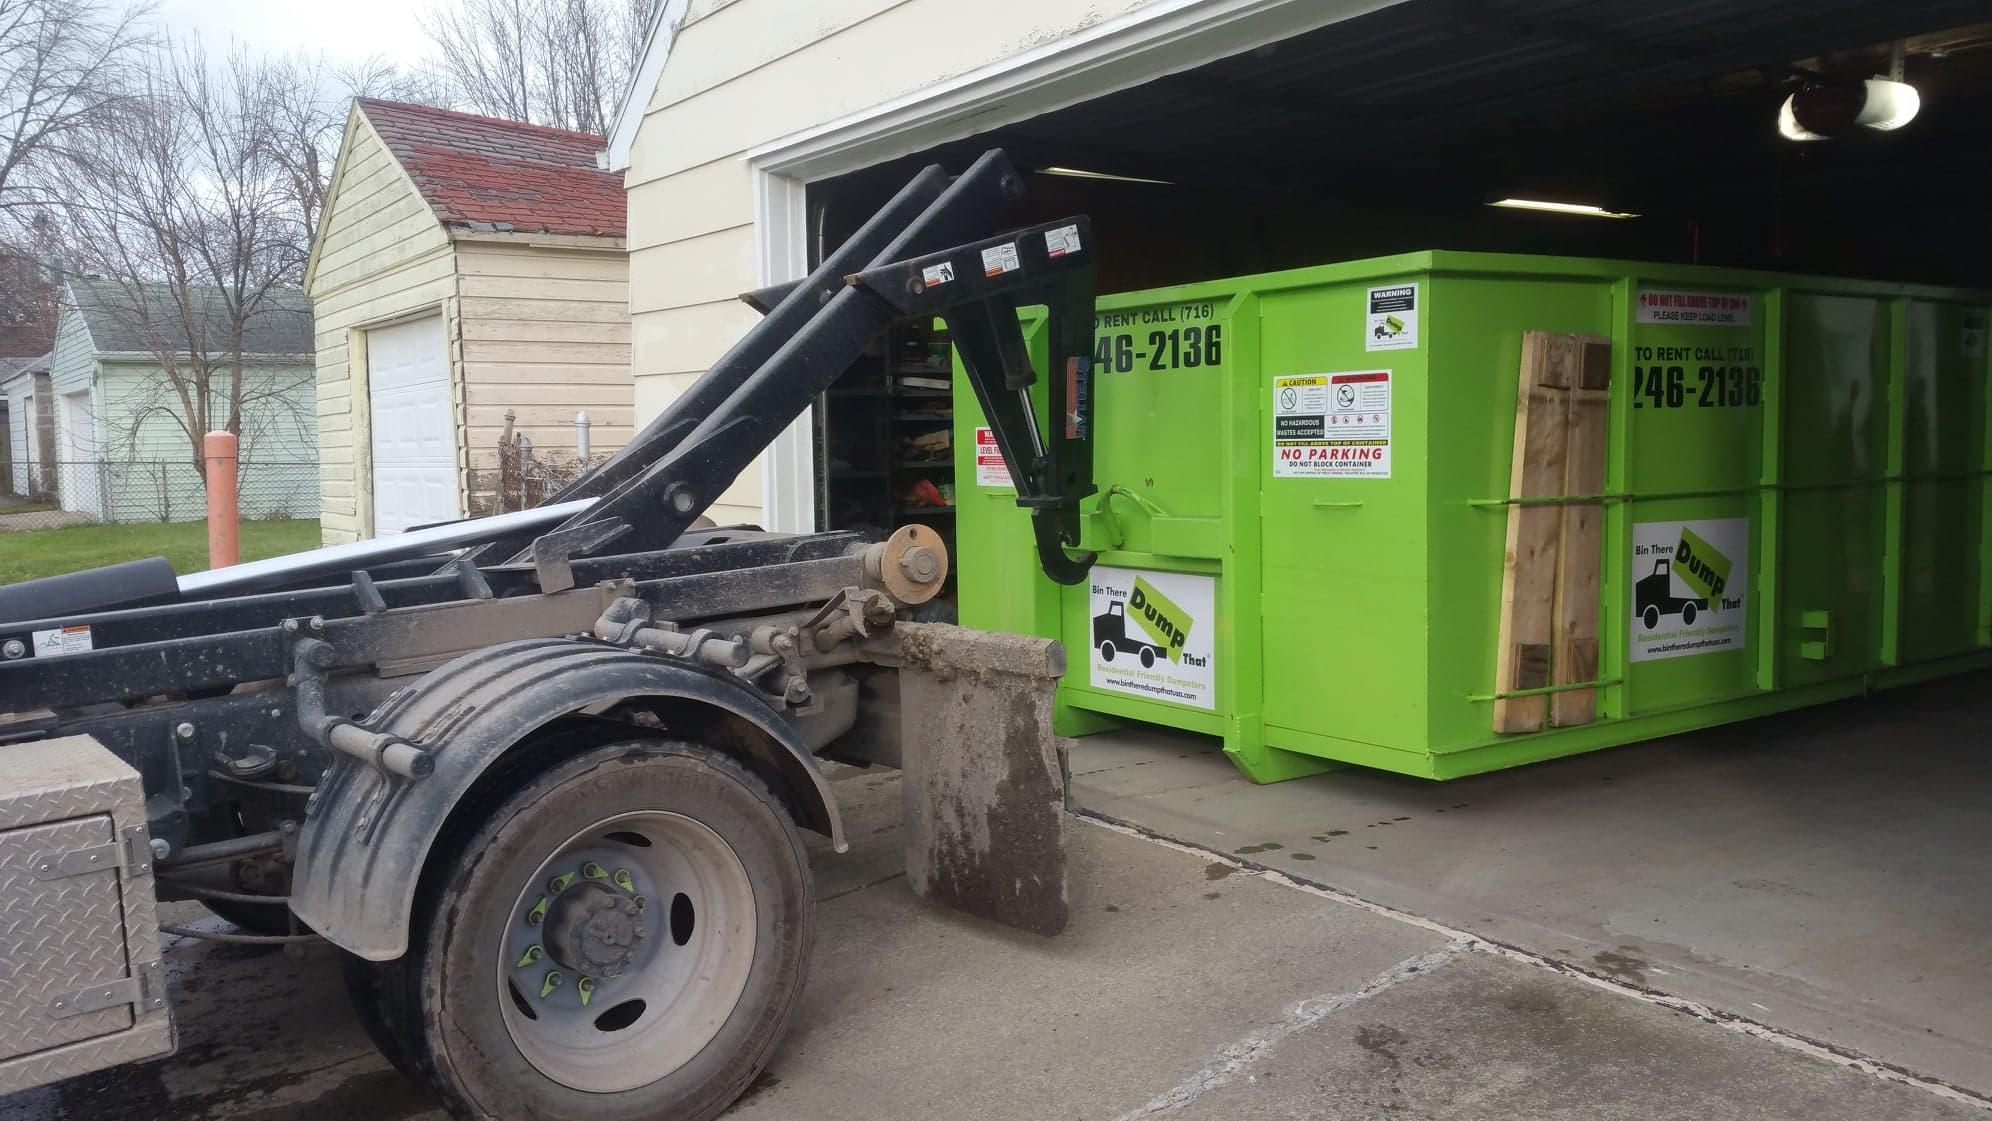 dumpster rental bin there dump that western new york